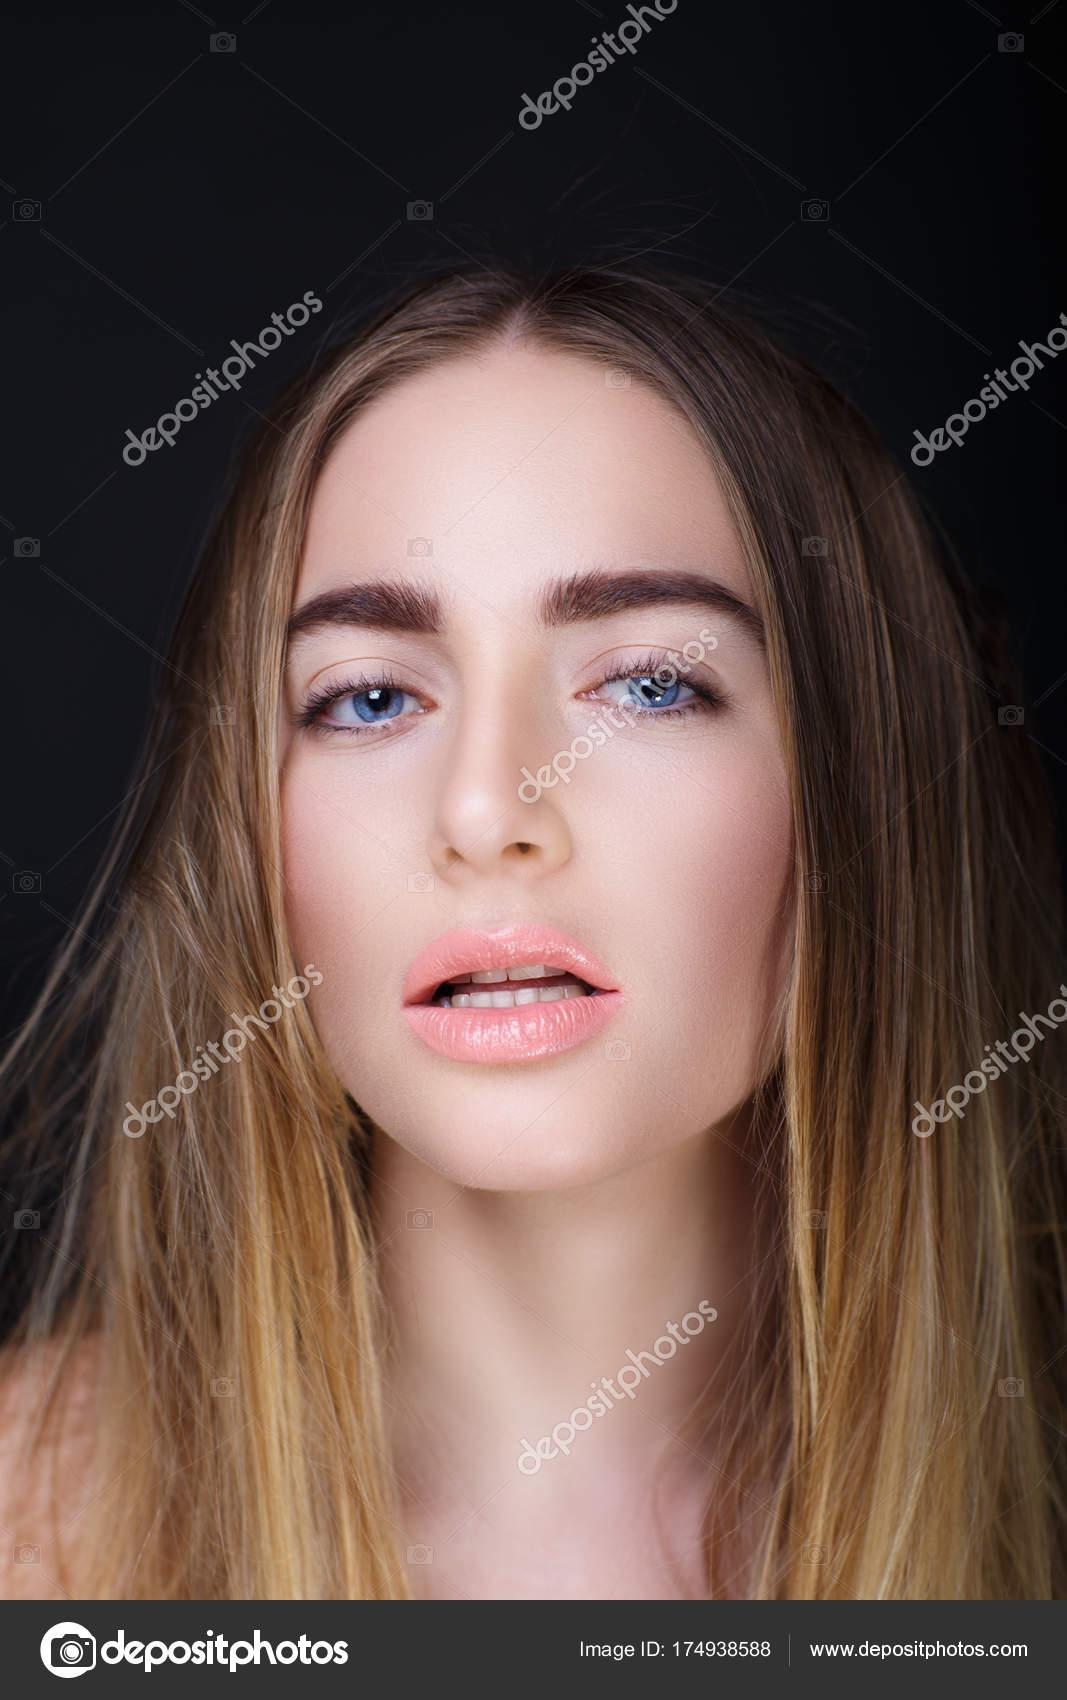 Woman ugly face \u2014 Stock Photo © OlgaOsa 174938588